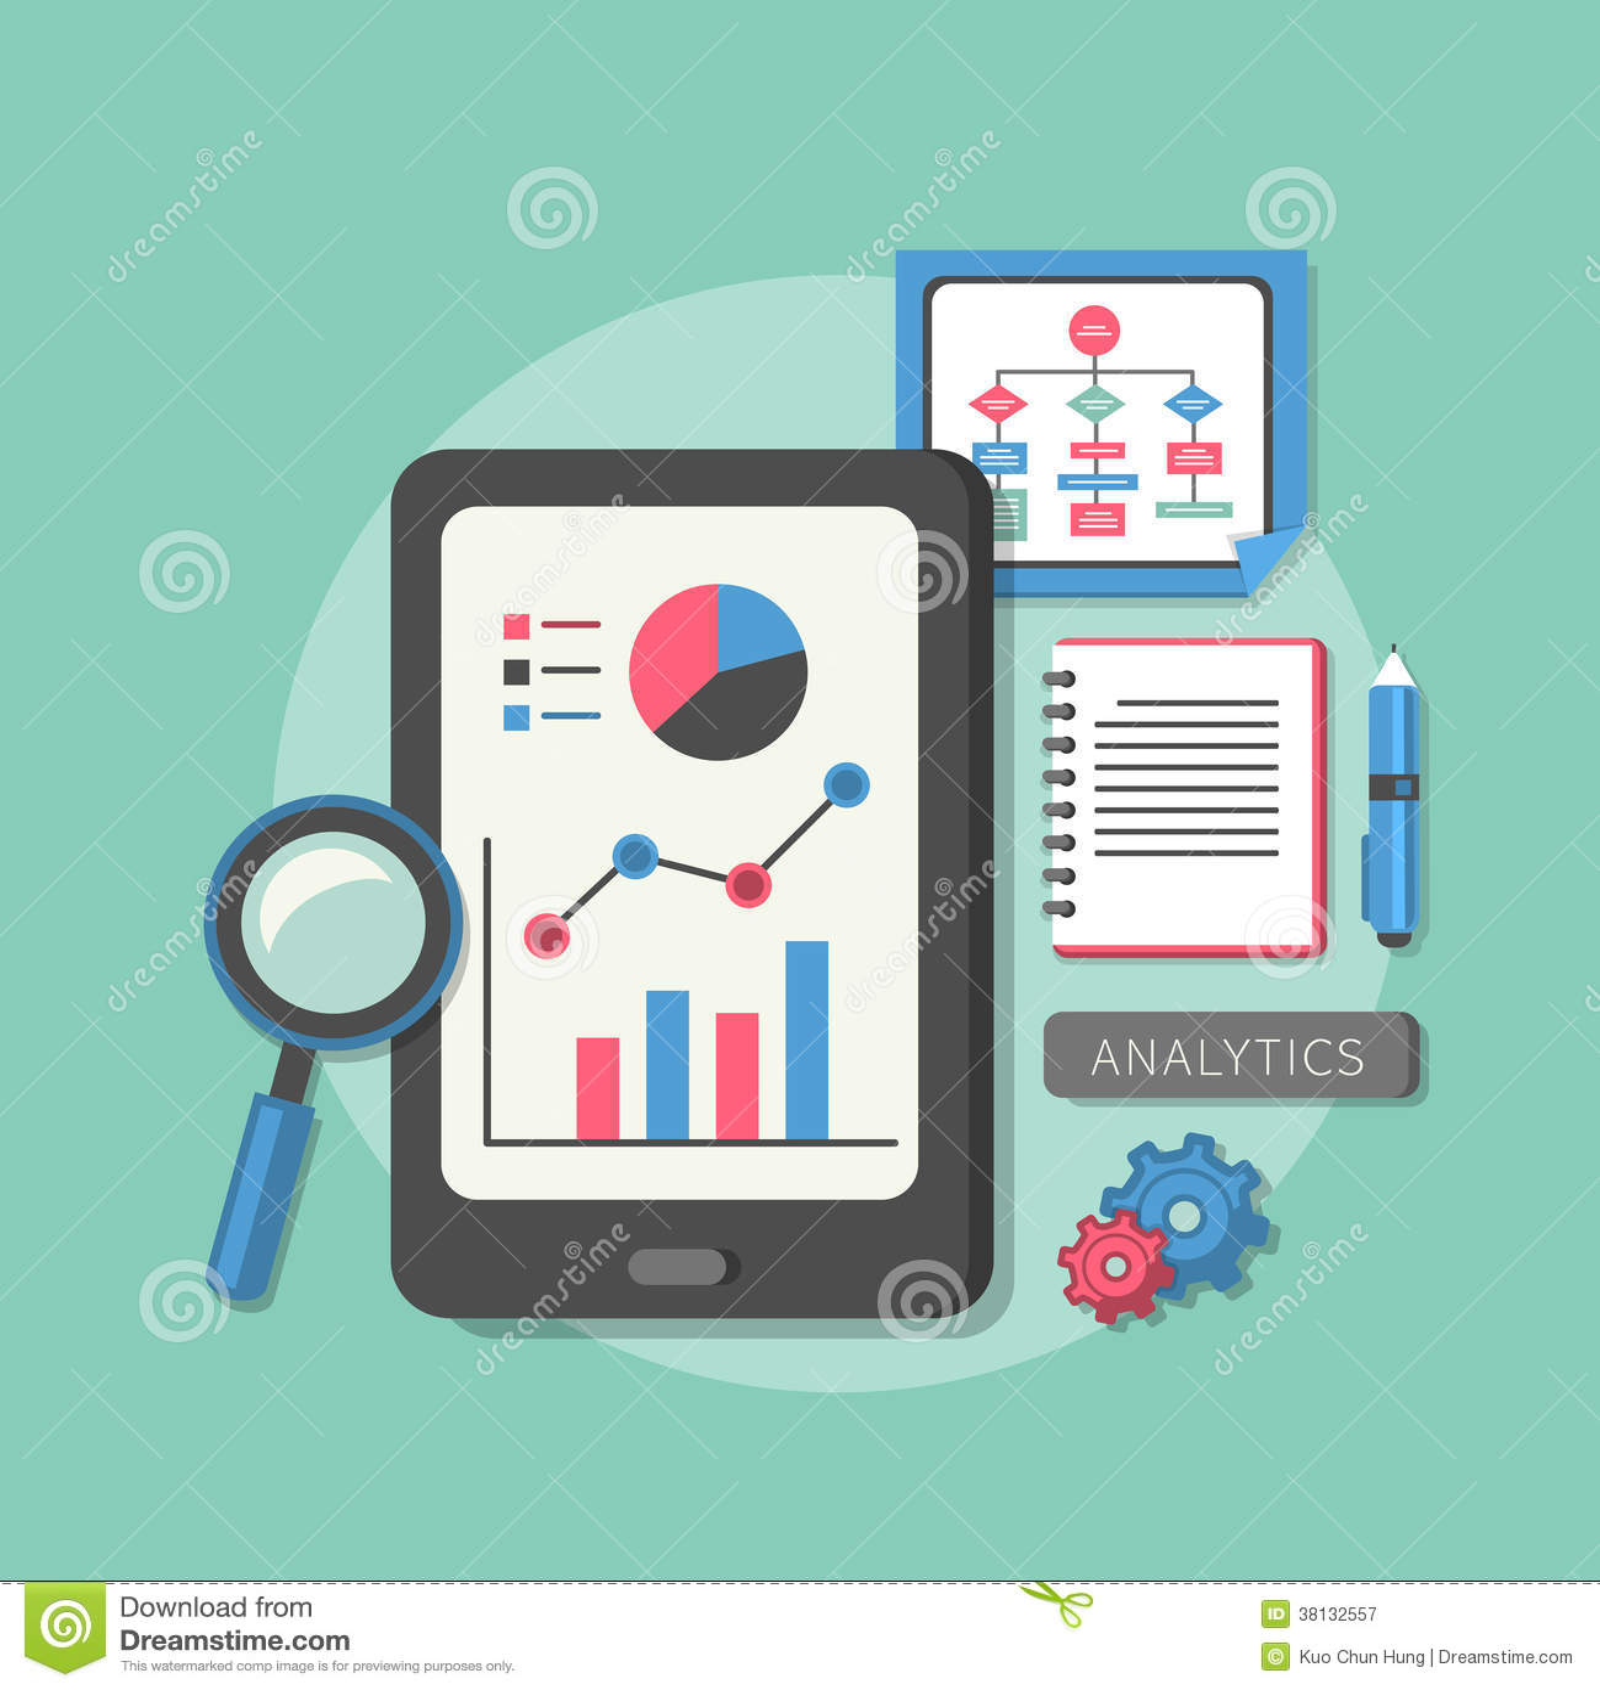 Flat design icon set of analytics elements